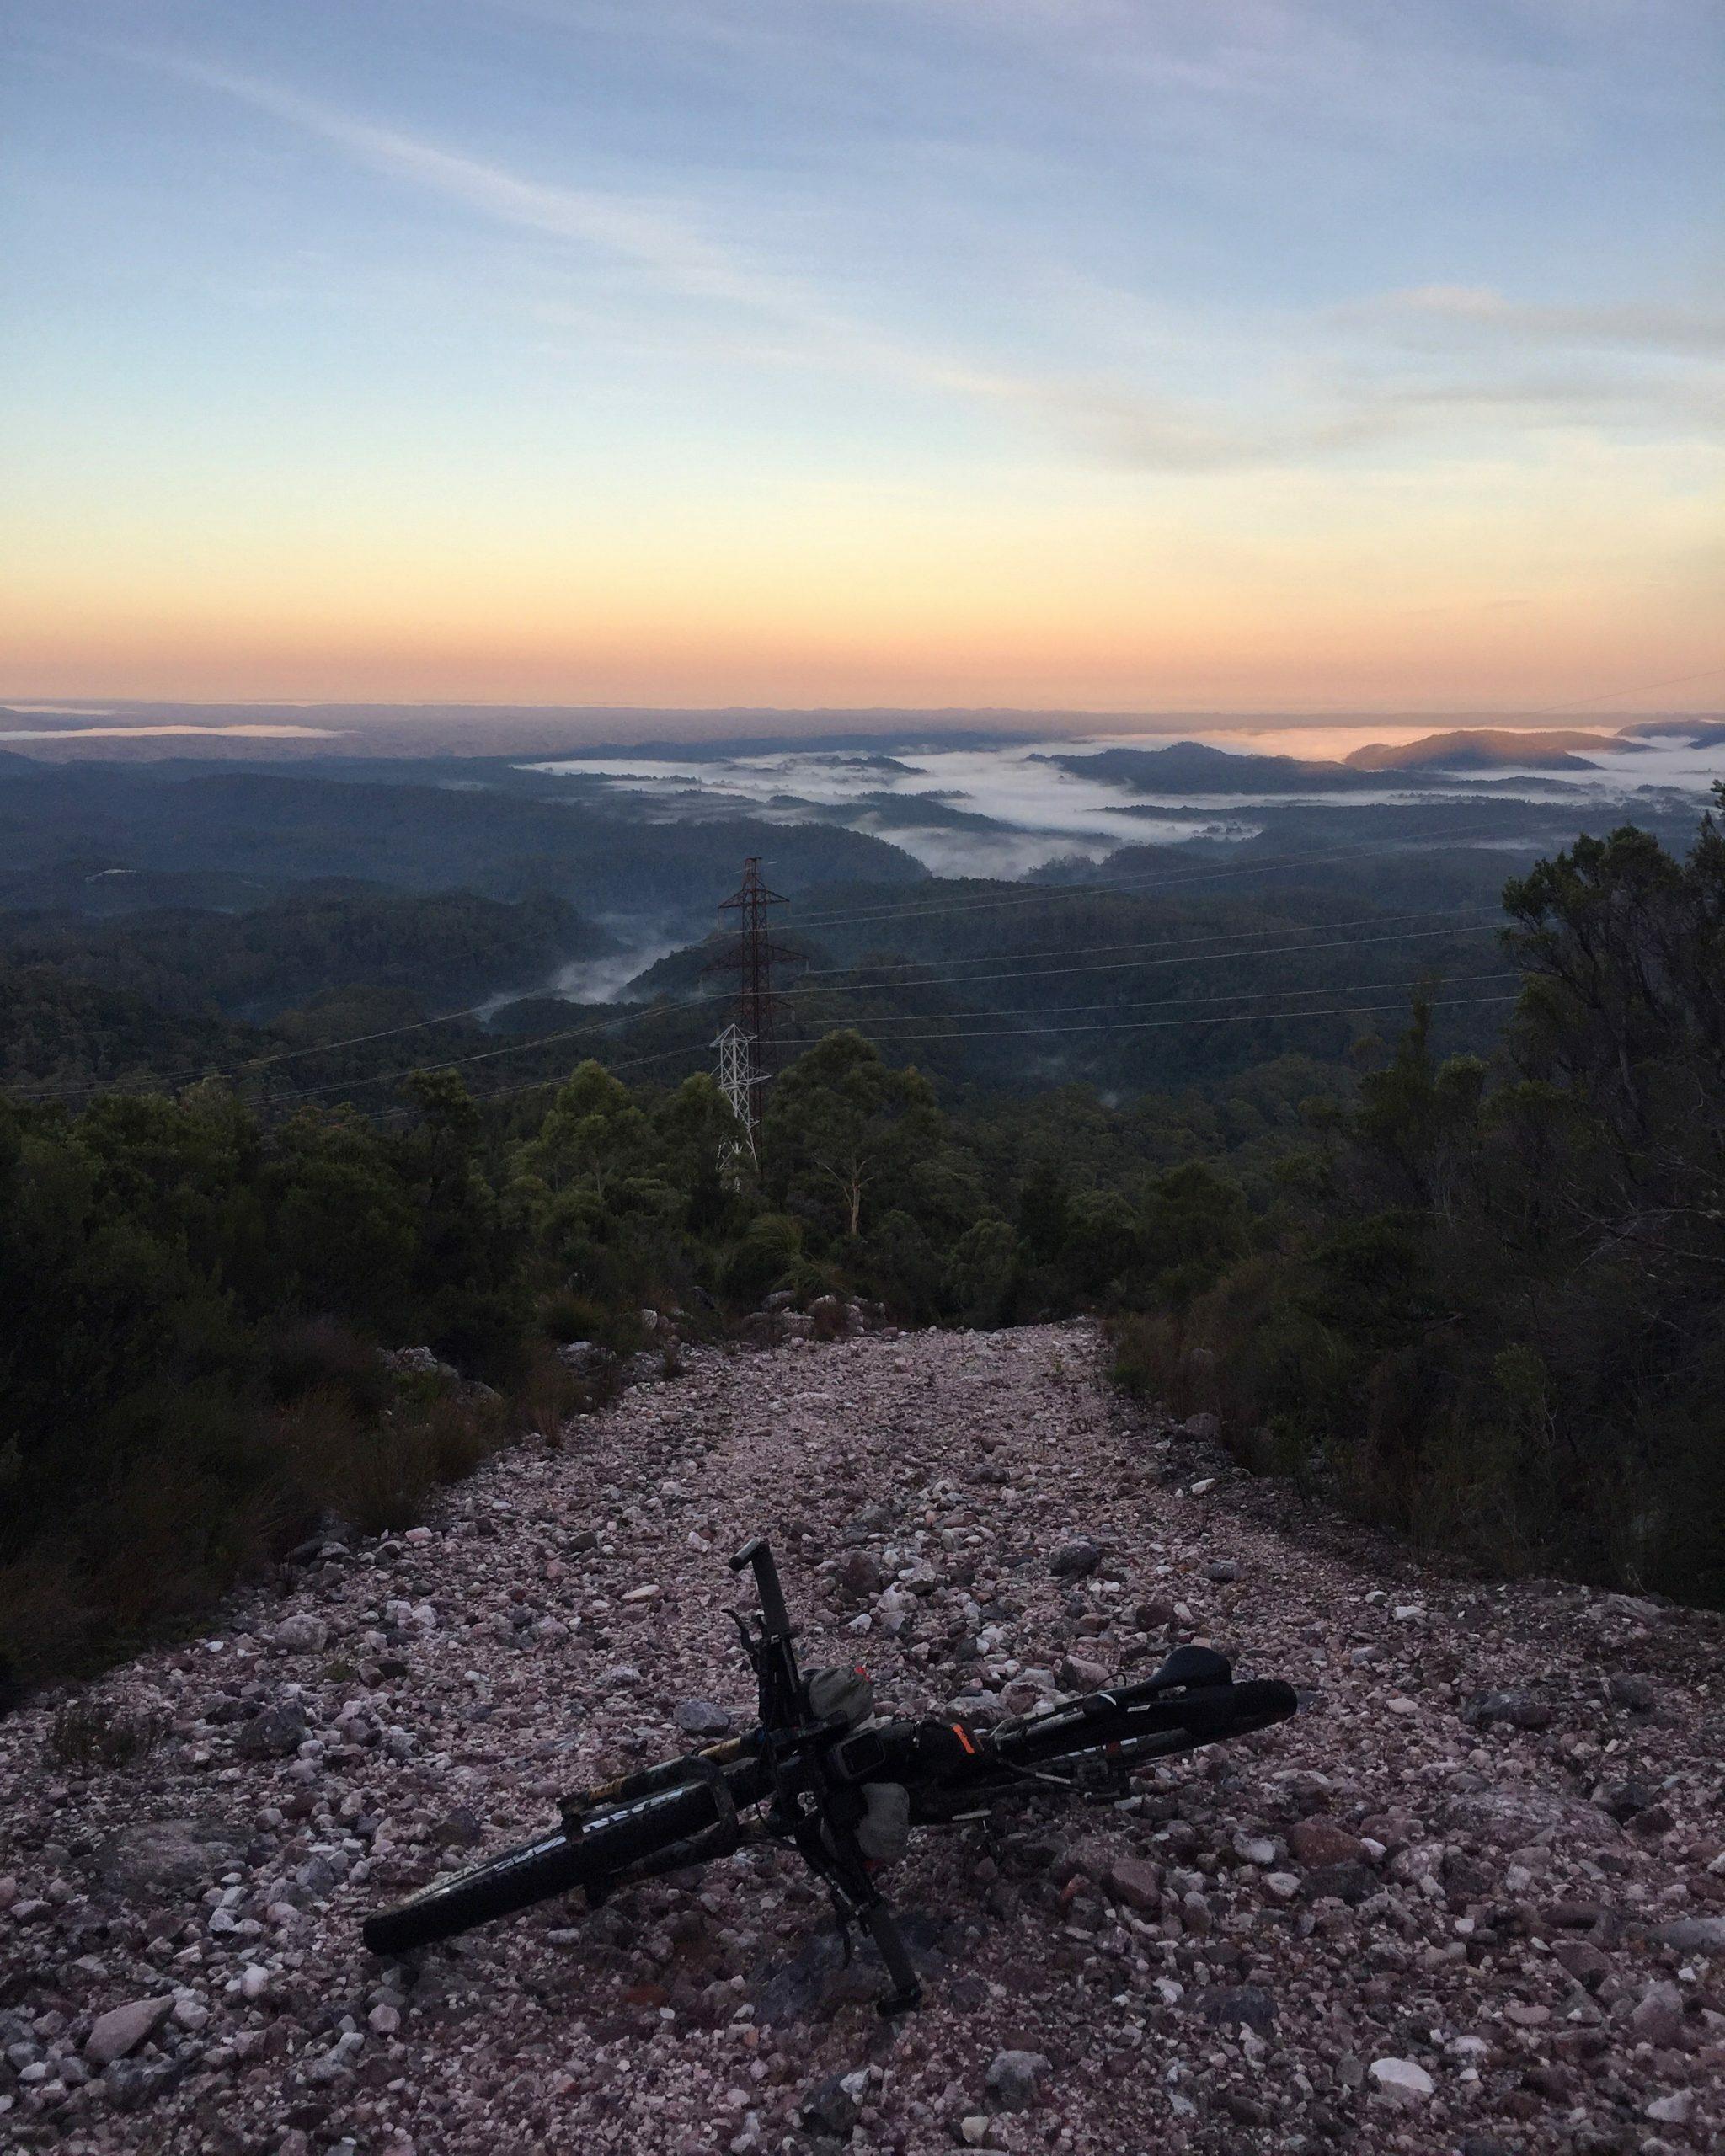 Hike a bike photo from Emma Flukes, somewhere in Tasmania